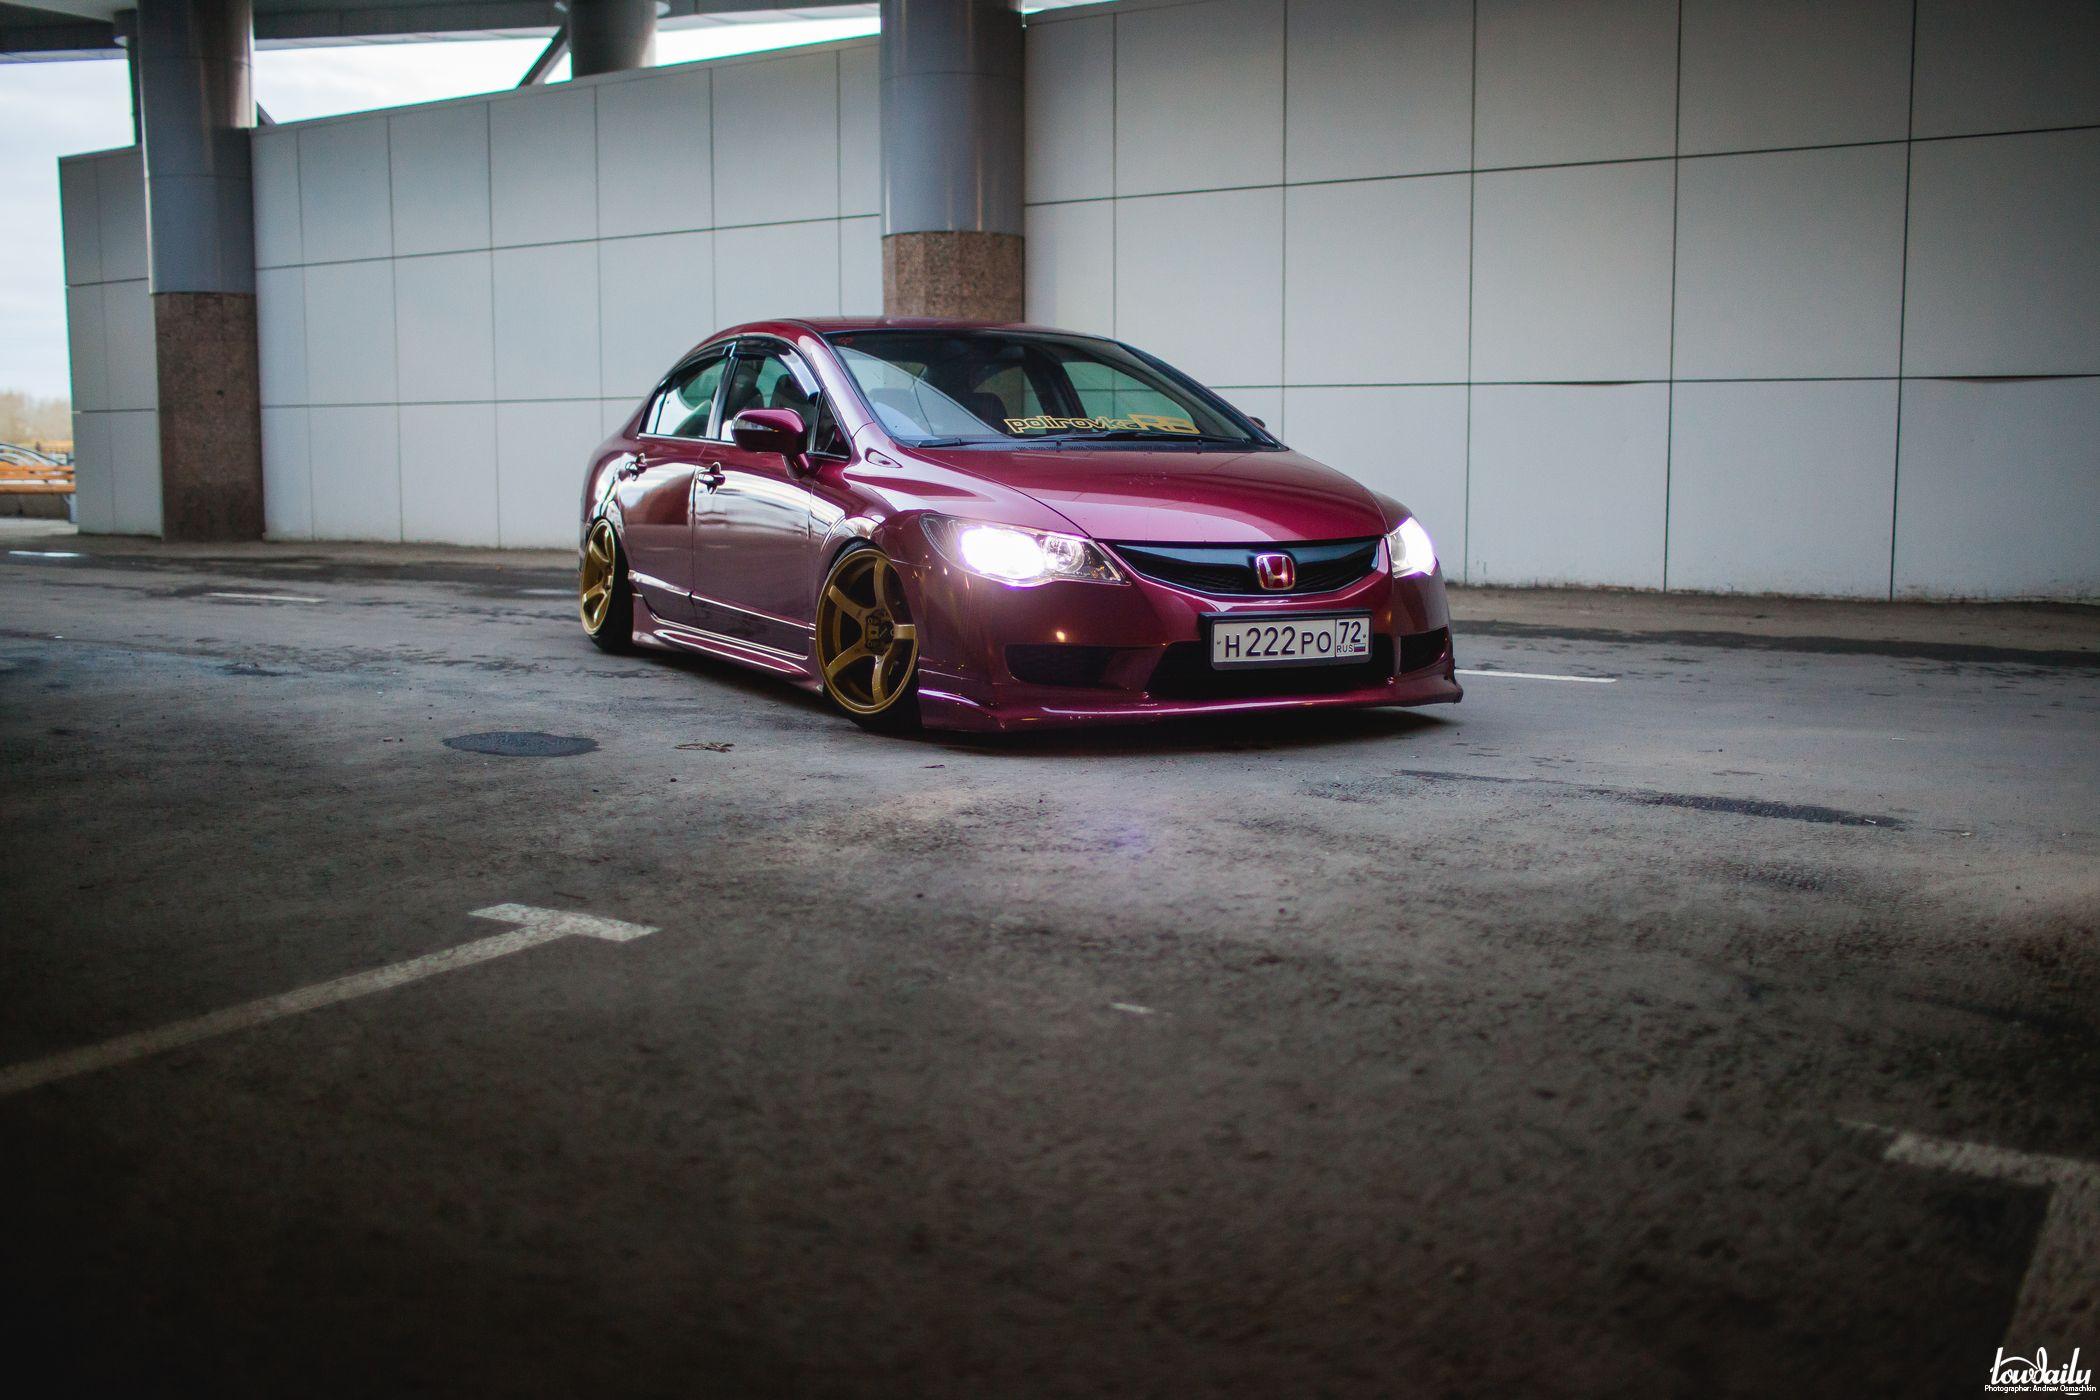 _Mg_5474_Honda_Civic